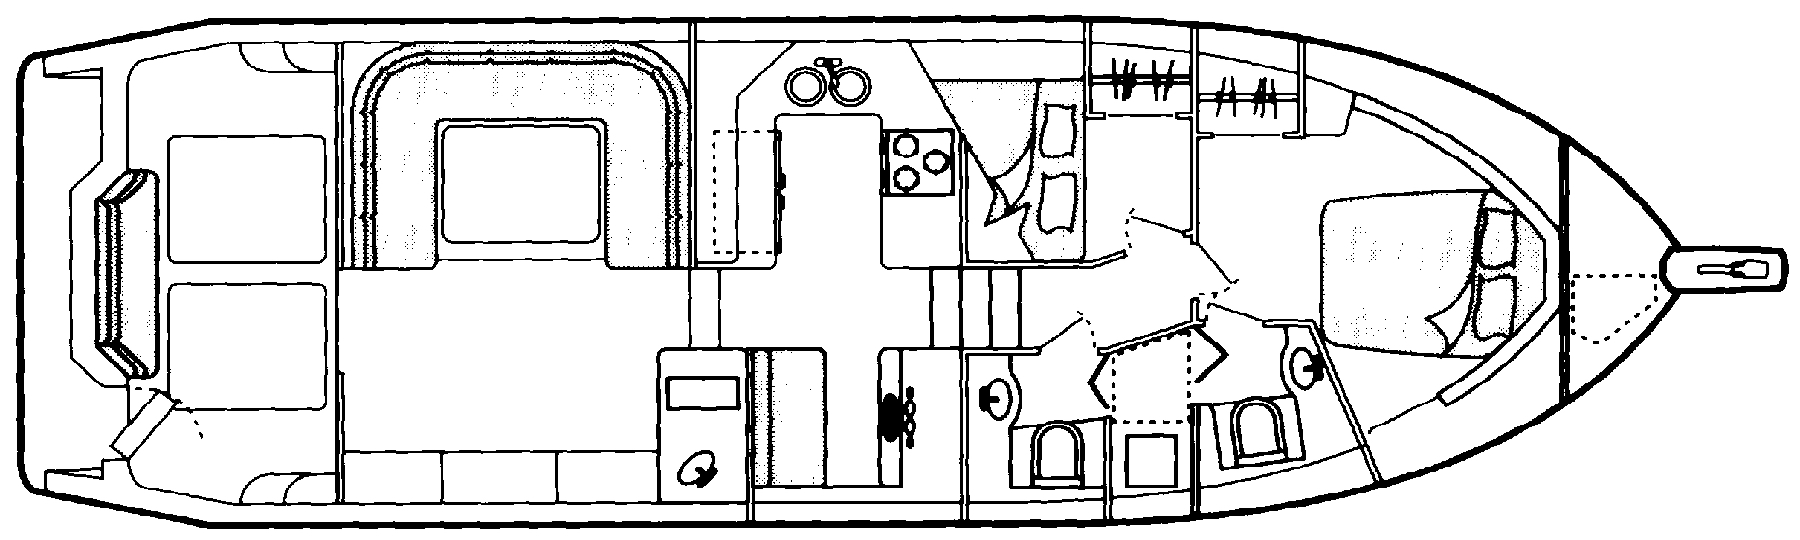 4388 Motor Yacht Floor Plan 1